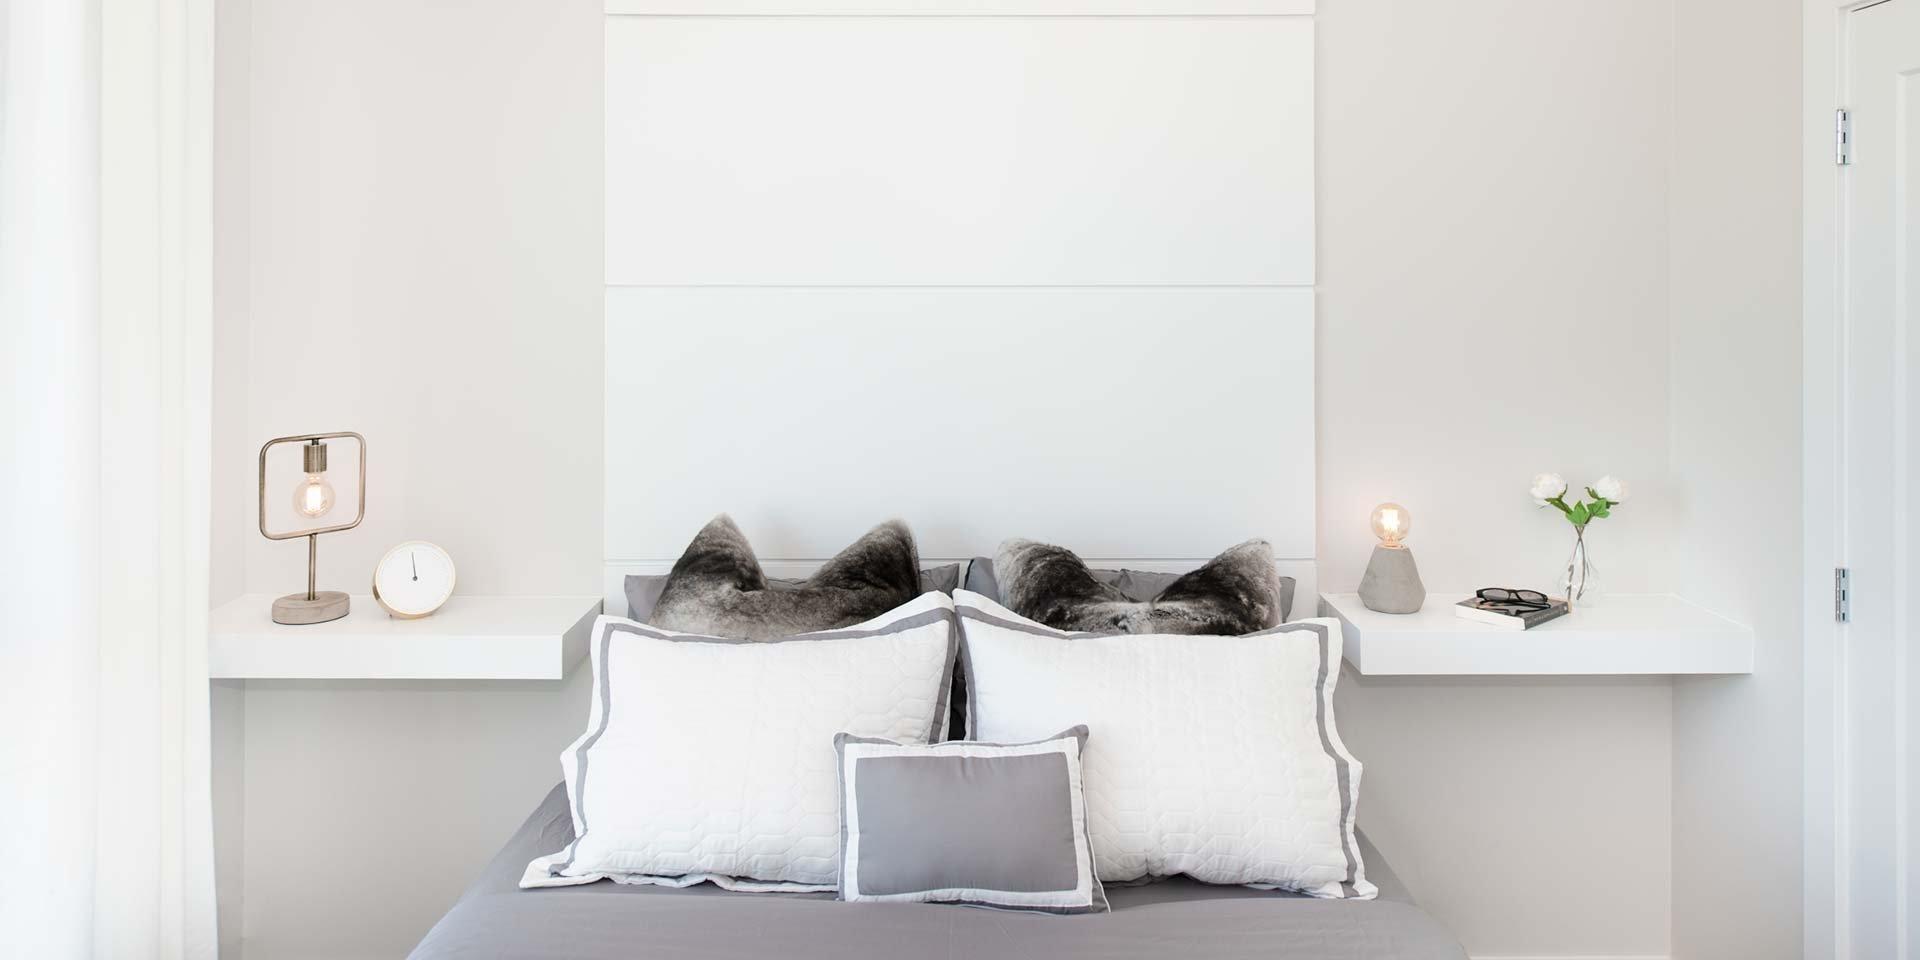 Bedroom - 16511 Watson Dr, Surrey, BC V4N 6T7, Canada!